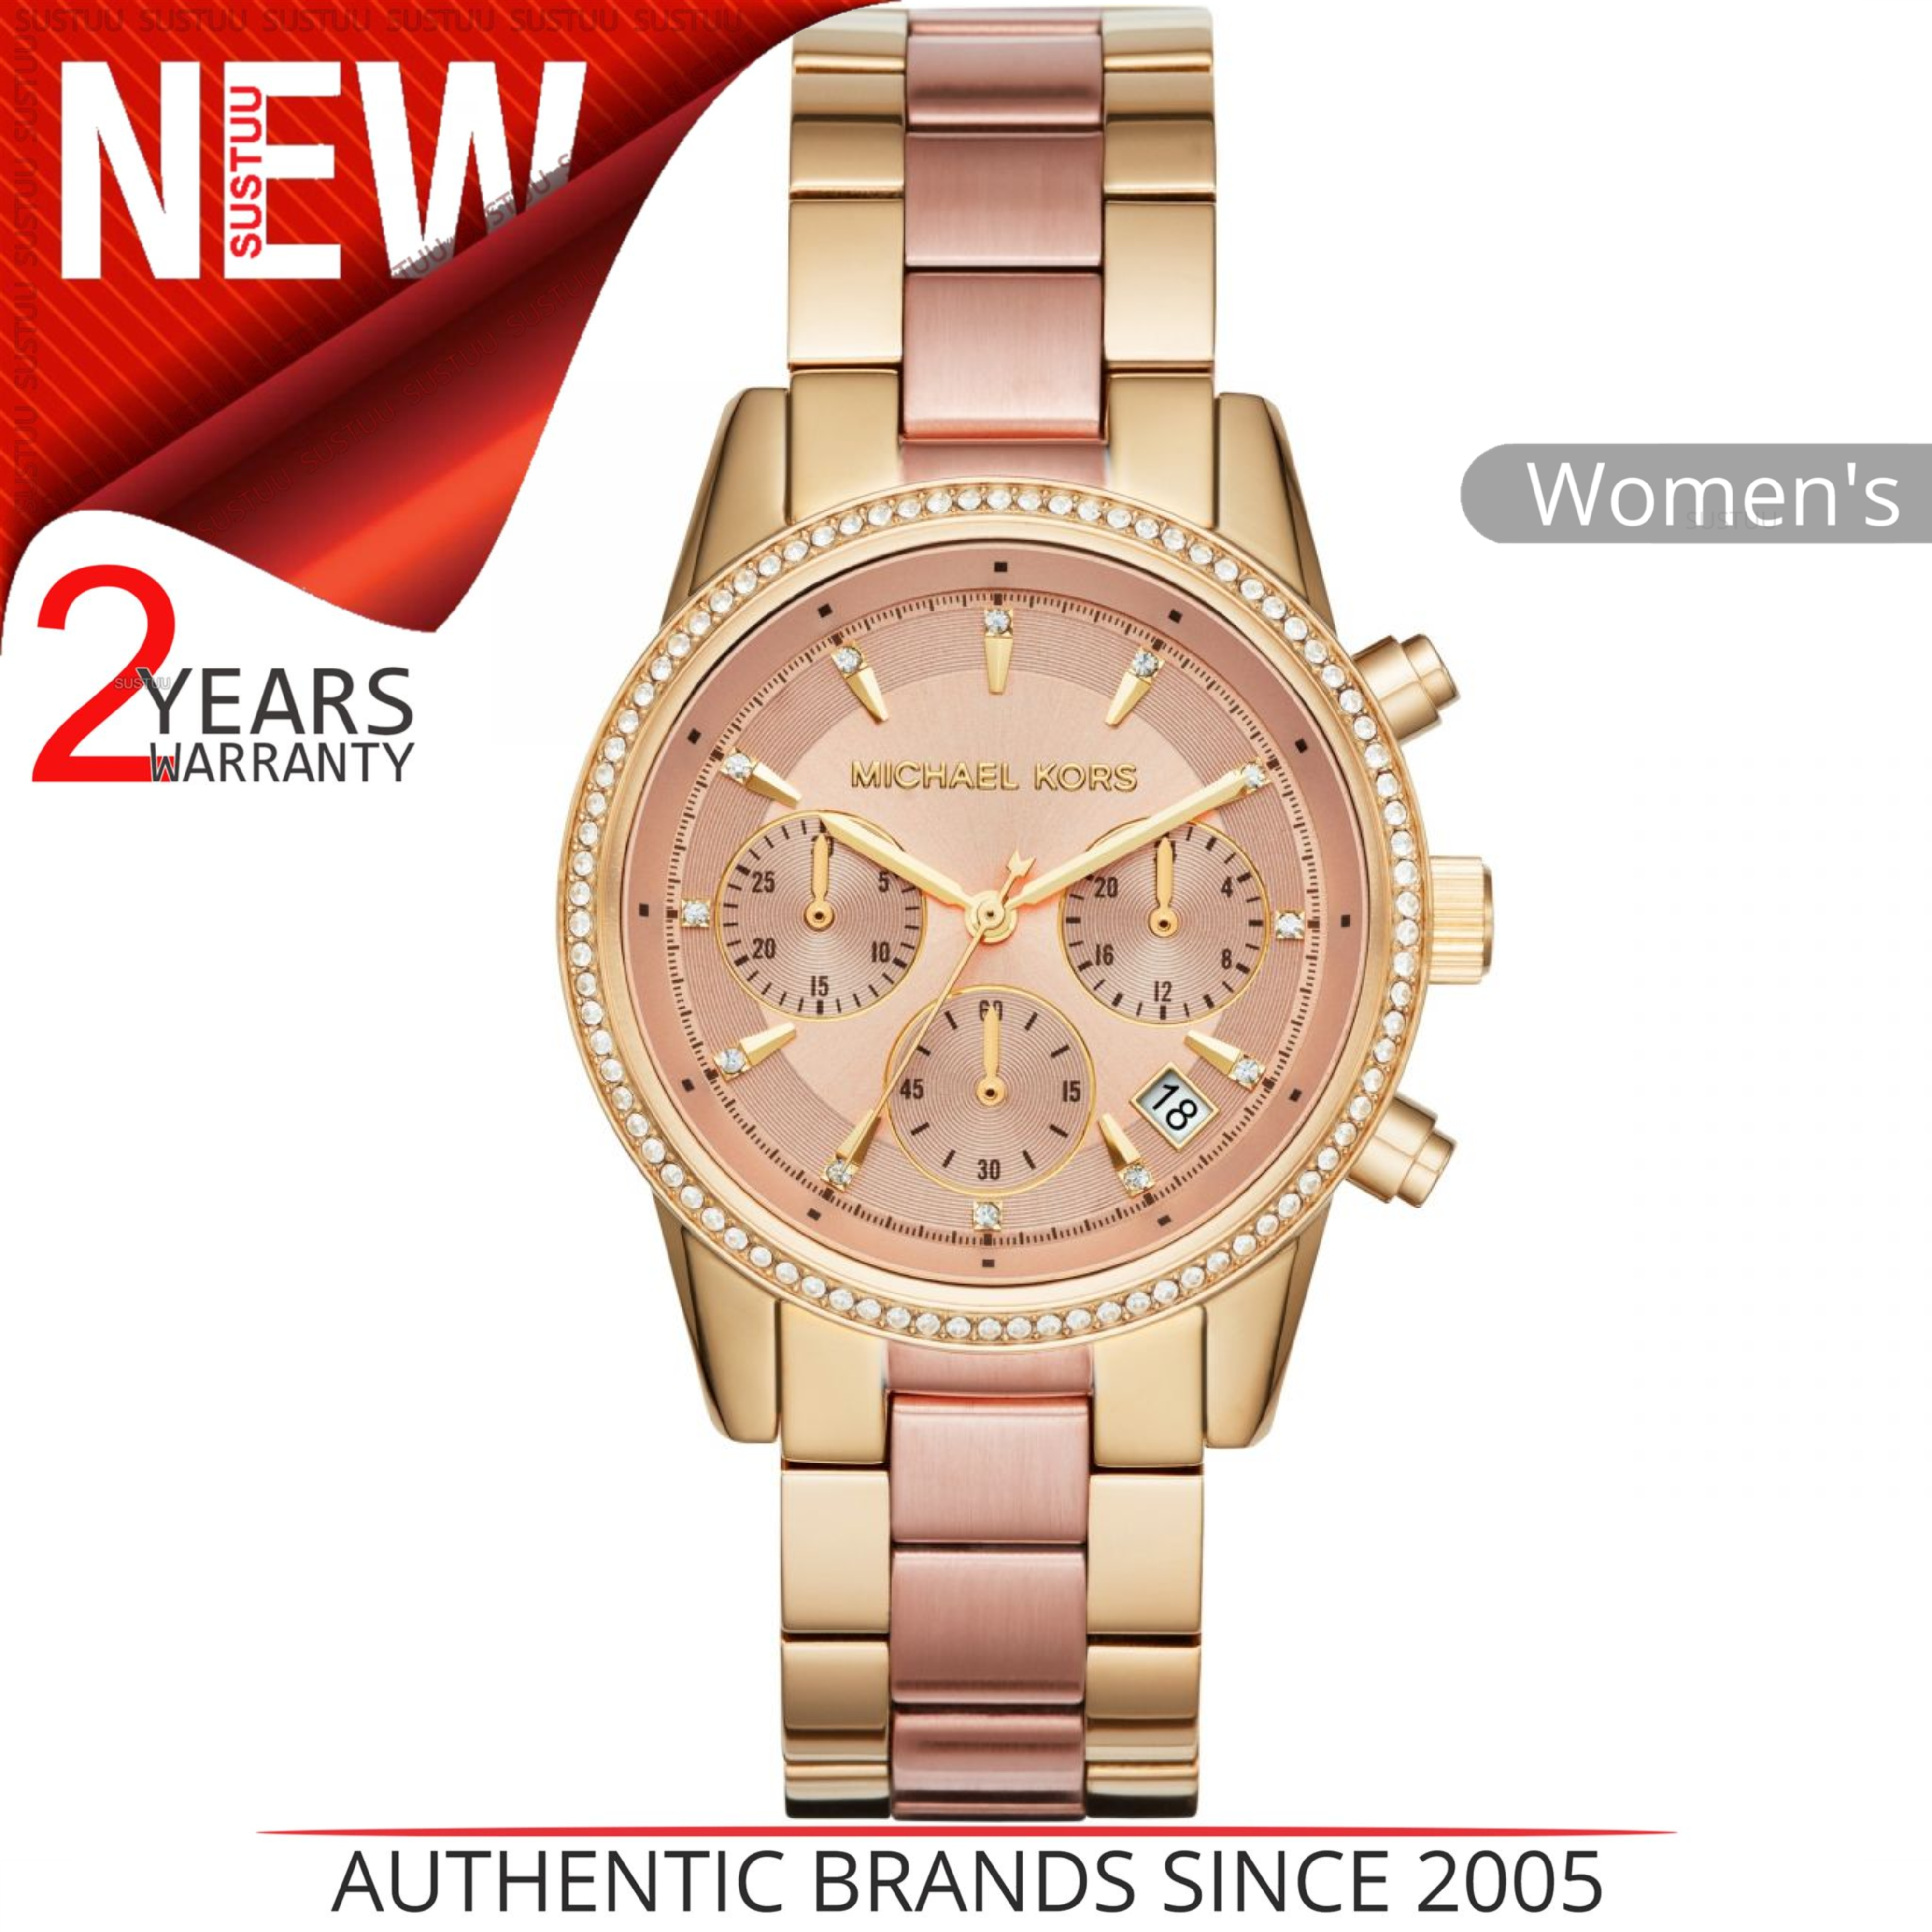 20a607a46e93 Details about Michael Kors Ritz Women s Watch MK6475│Rose Gold Chronograph  Dial│Bracelet Strap